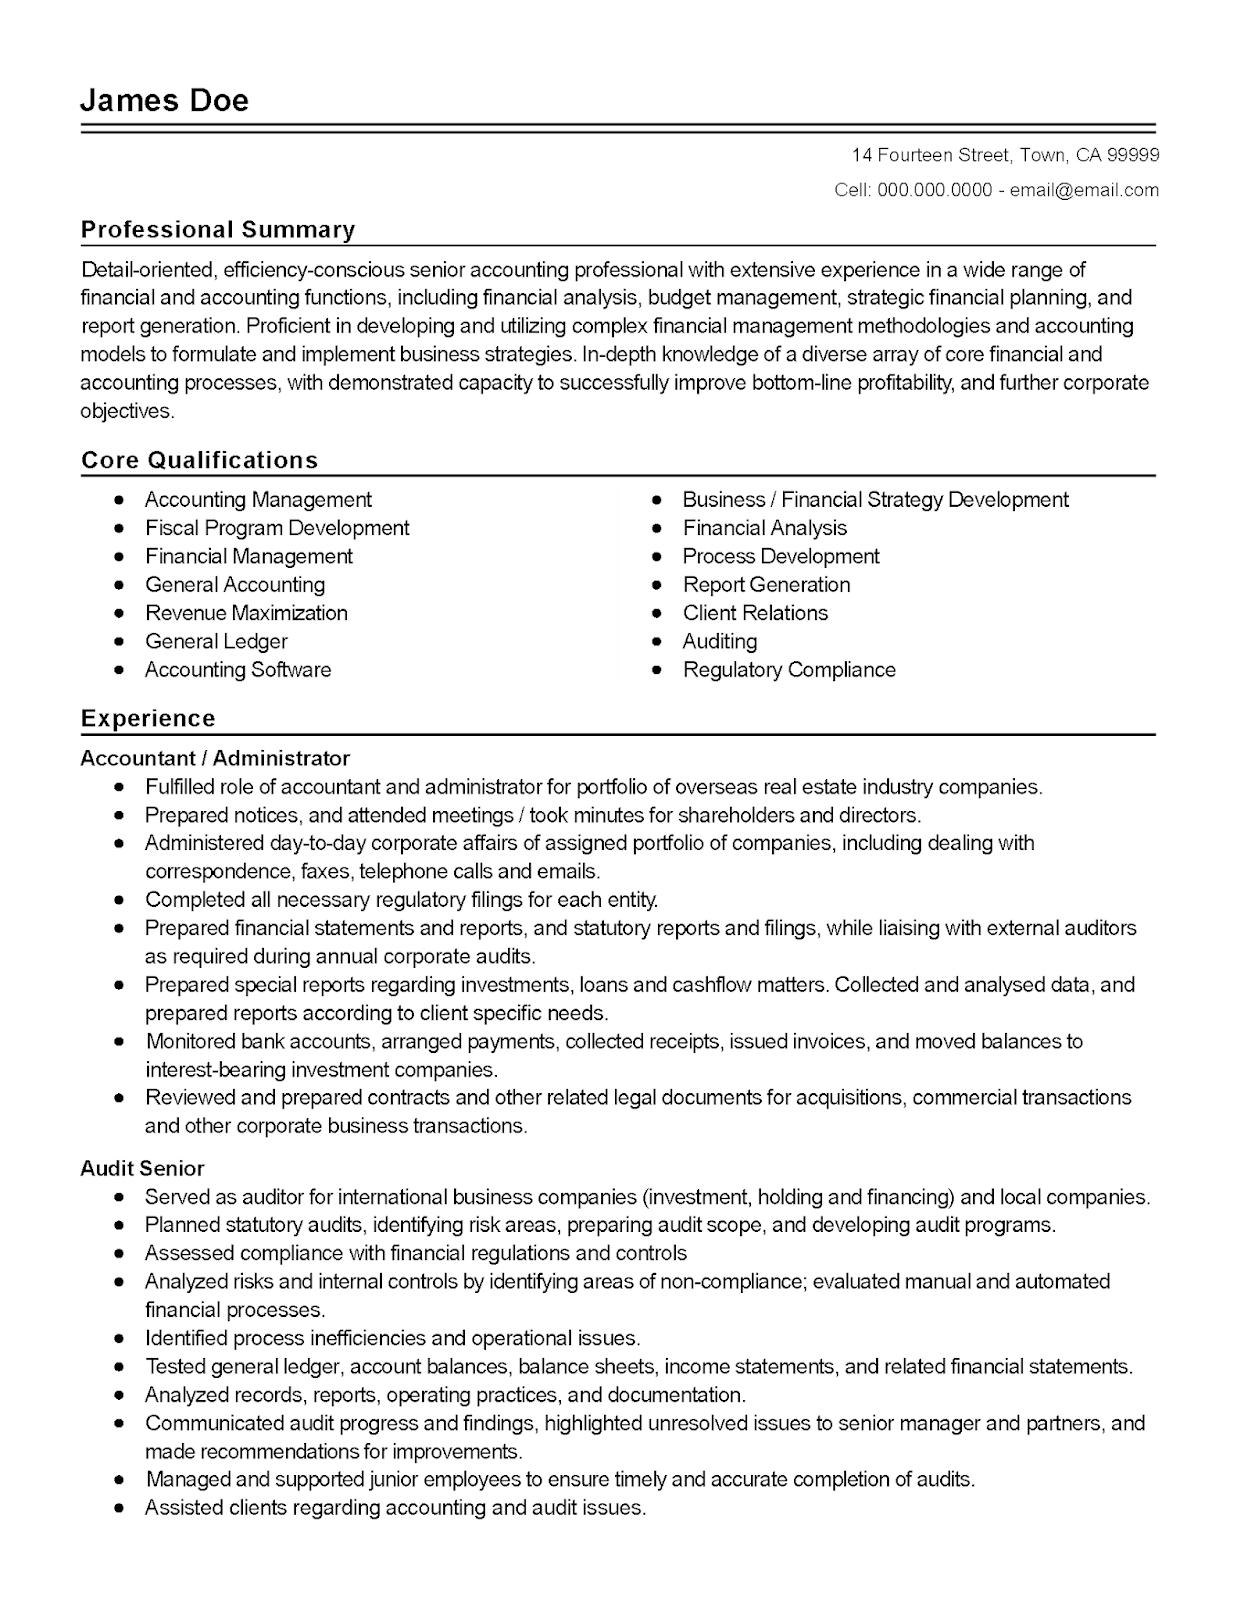 Professional Summary Experience Resume Templates 2020 Resume Objective Job Resume Template Resume Template